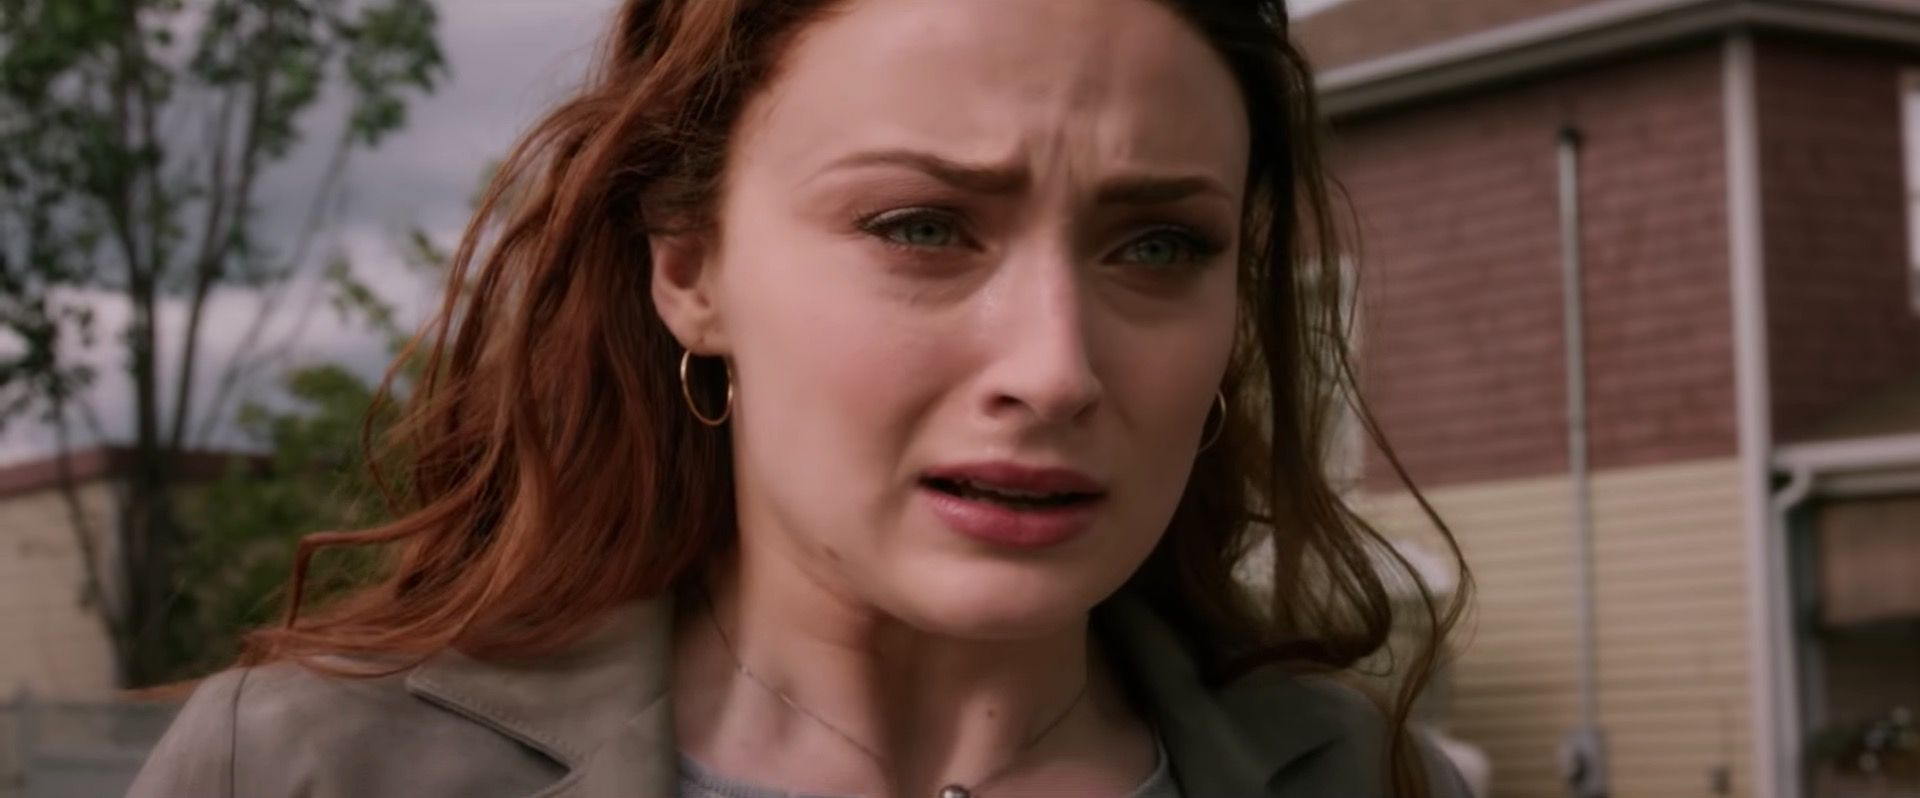 X Men Dark Phoenix Trailer Spoils Major Death